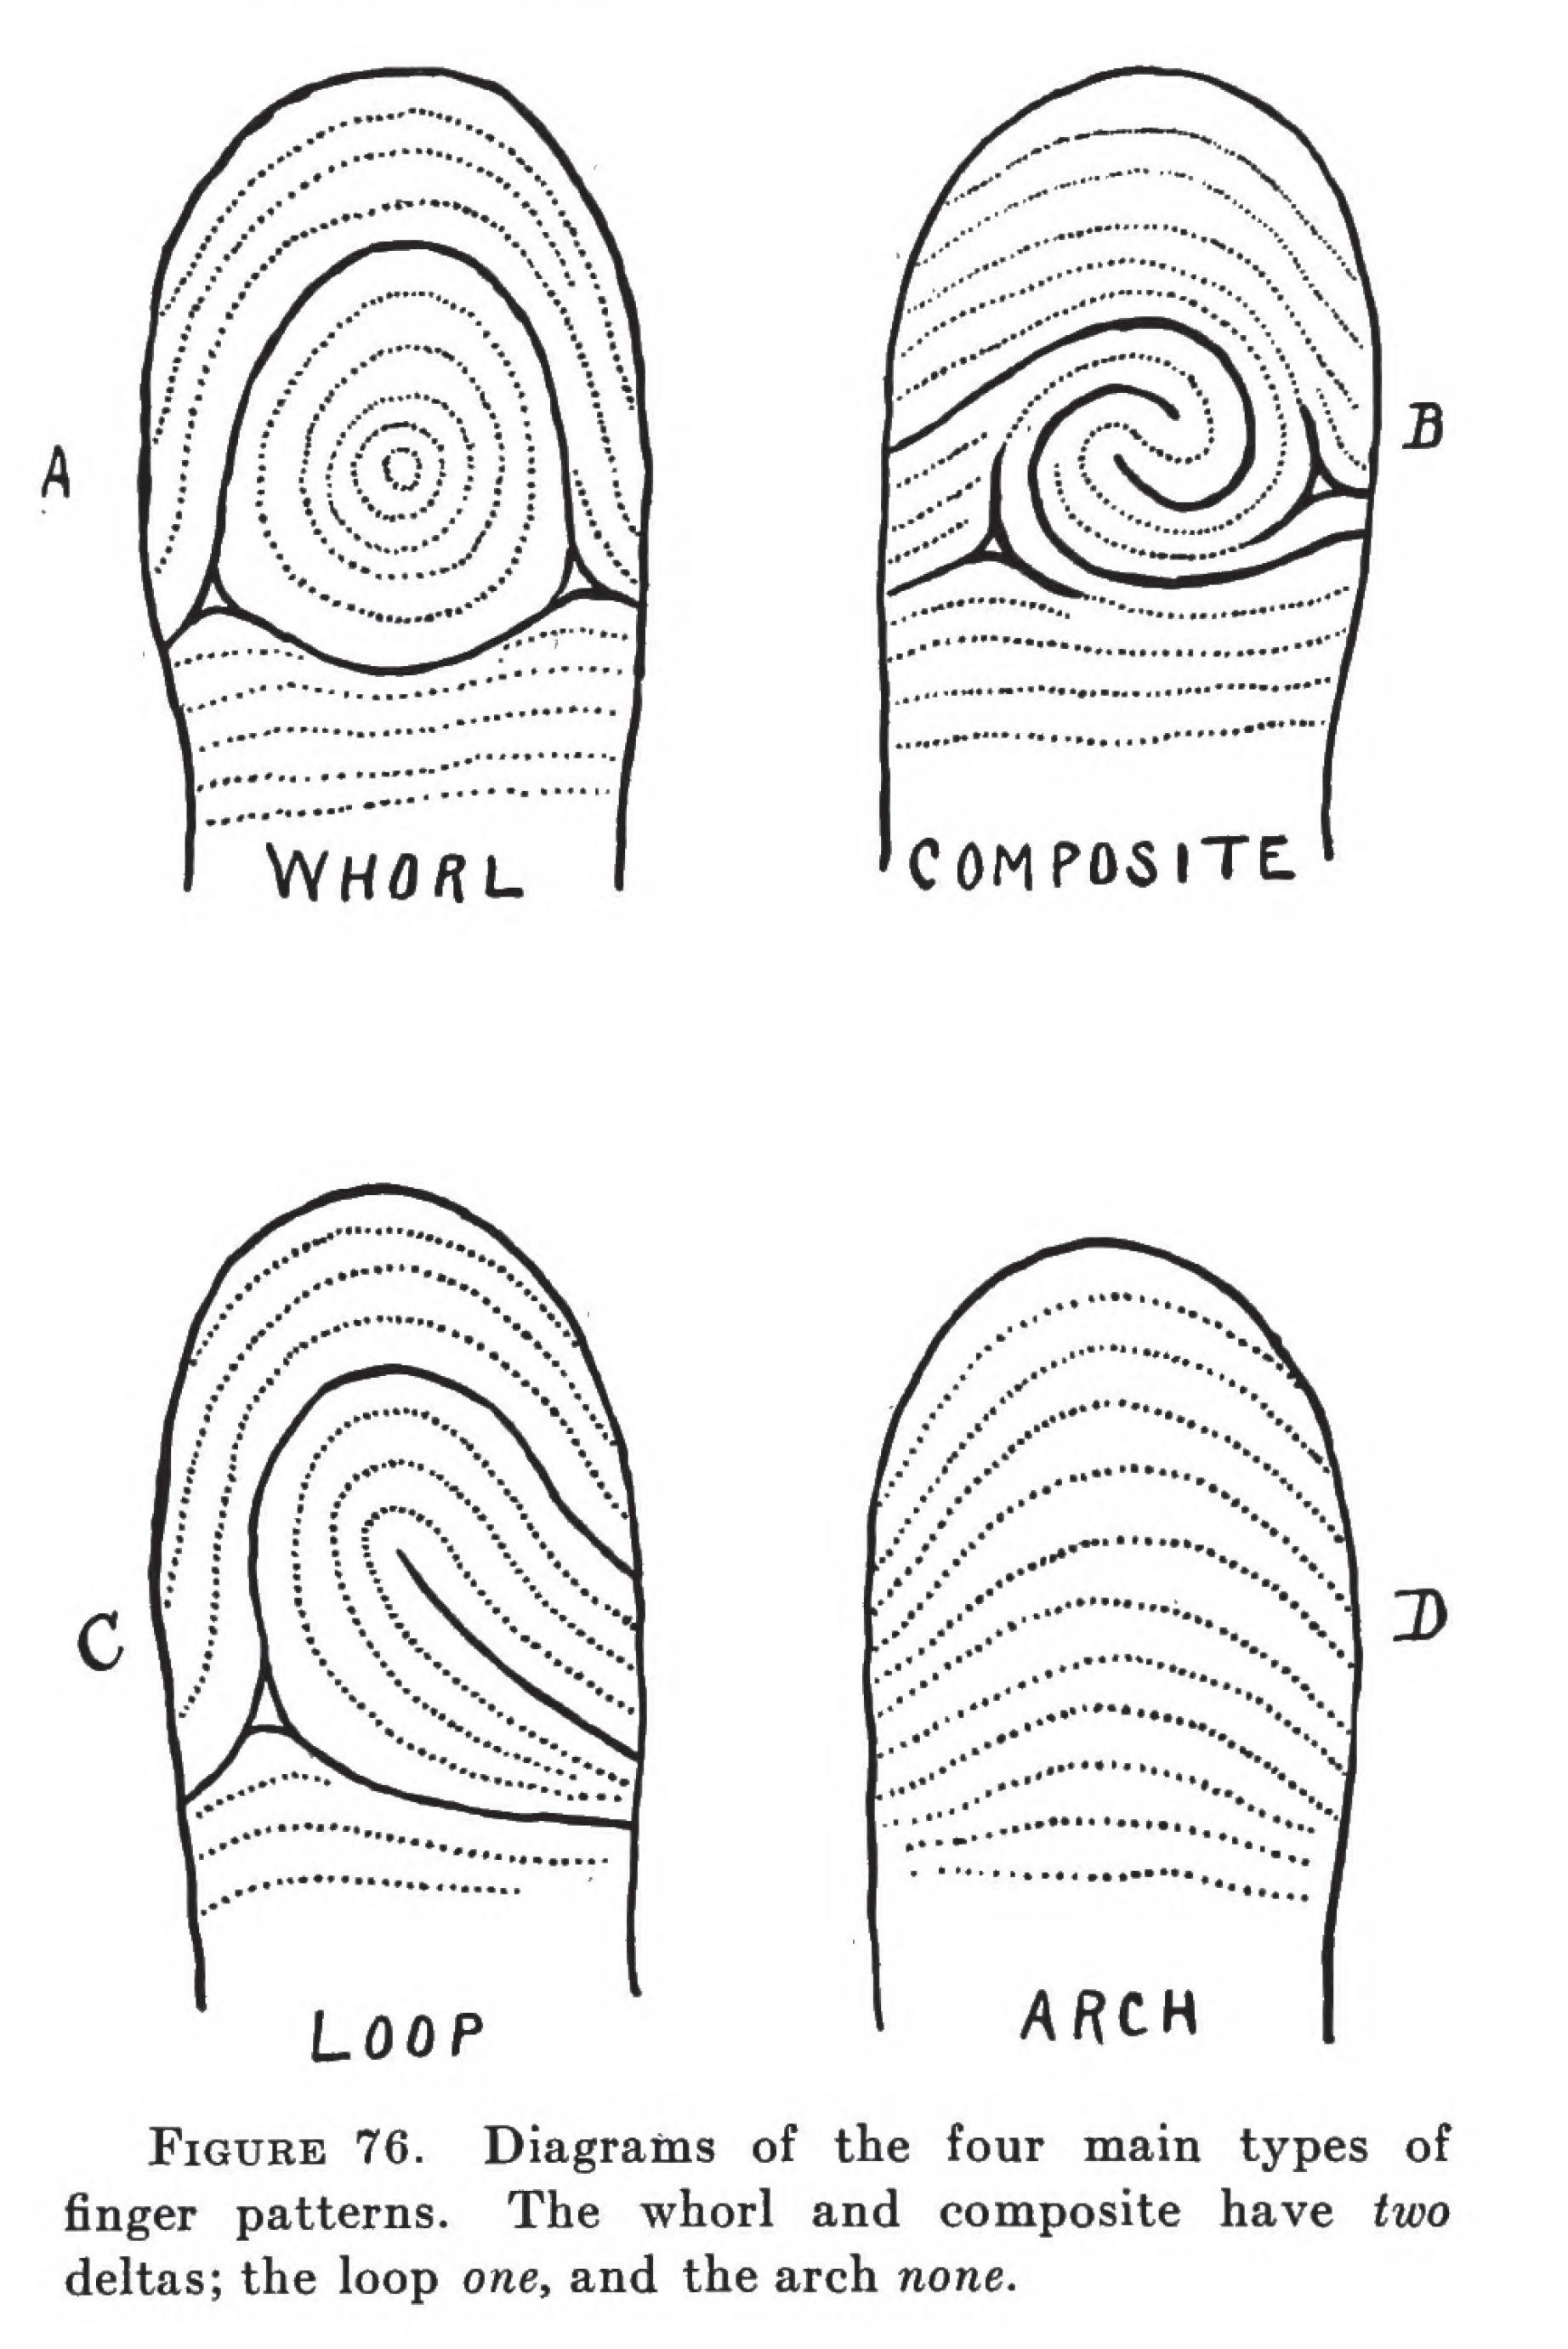 No Two Finger Prints Are Alike Fingerprinting In The Modern World